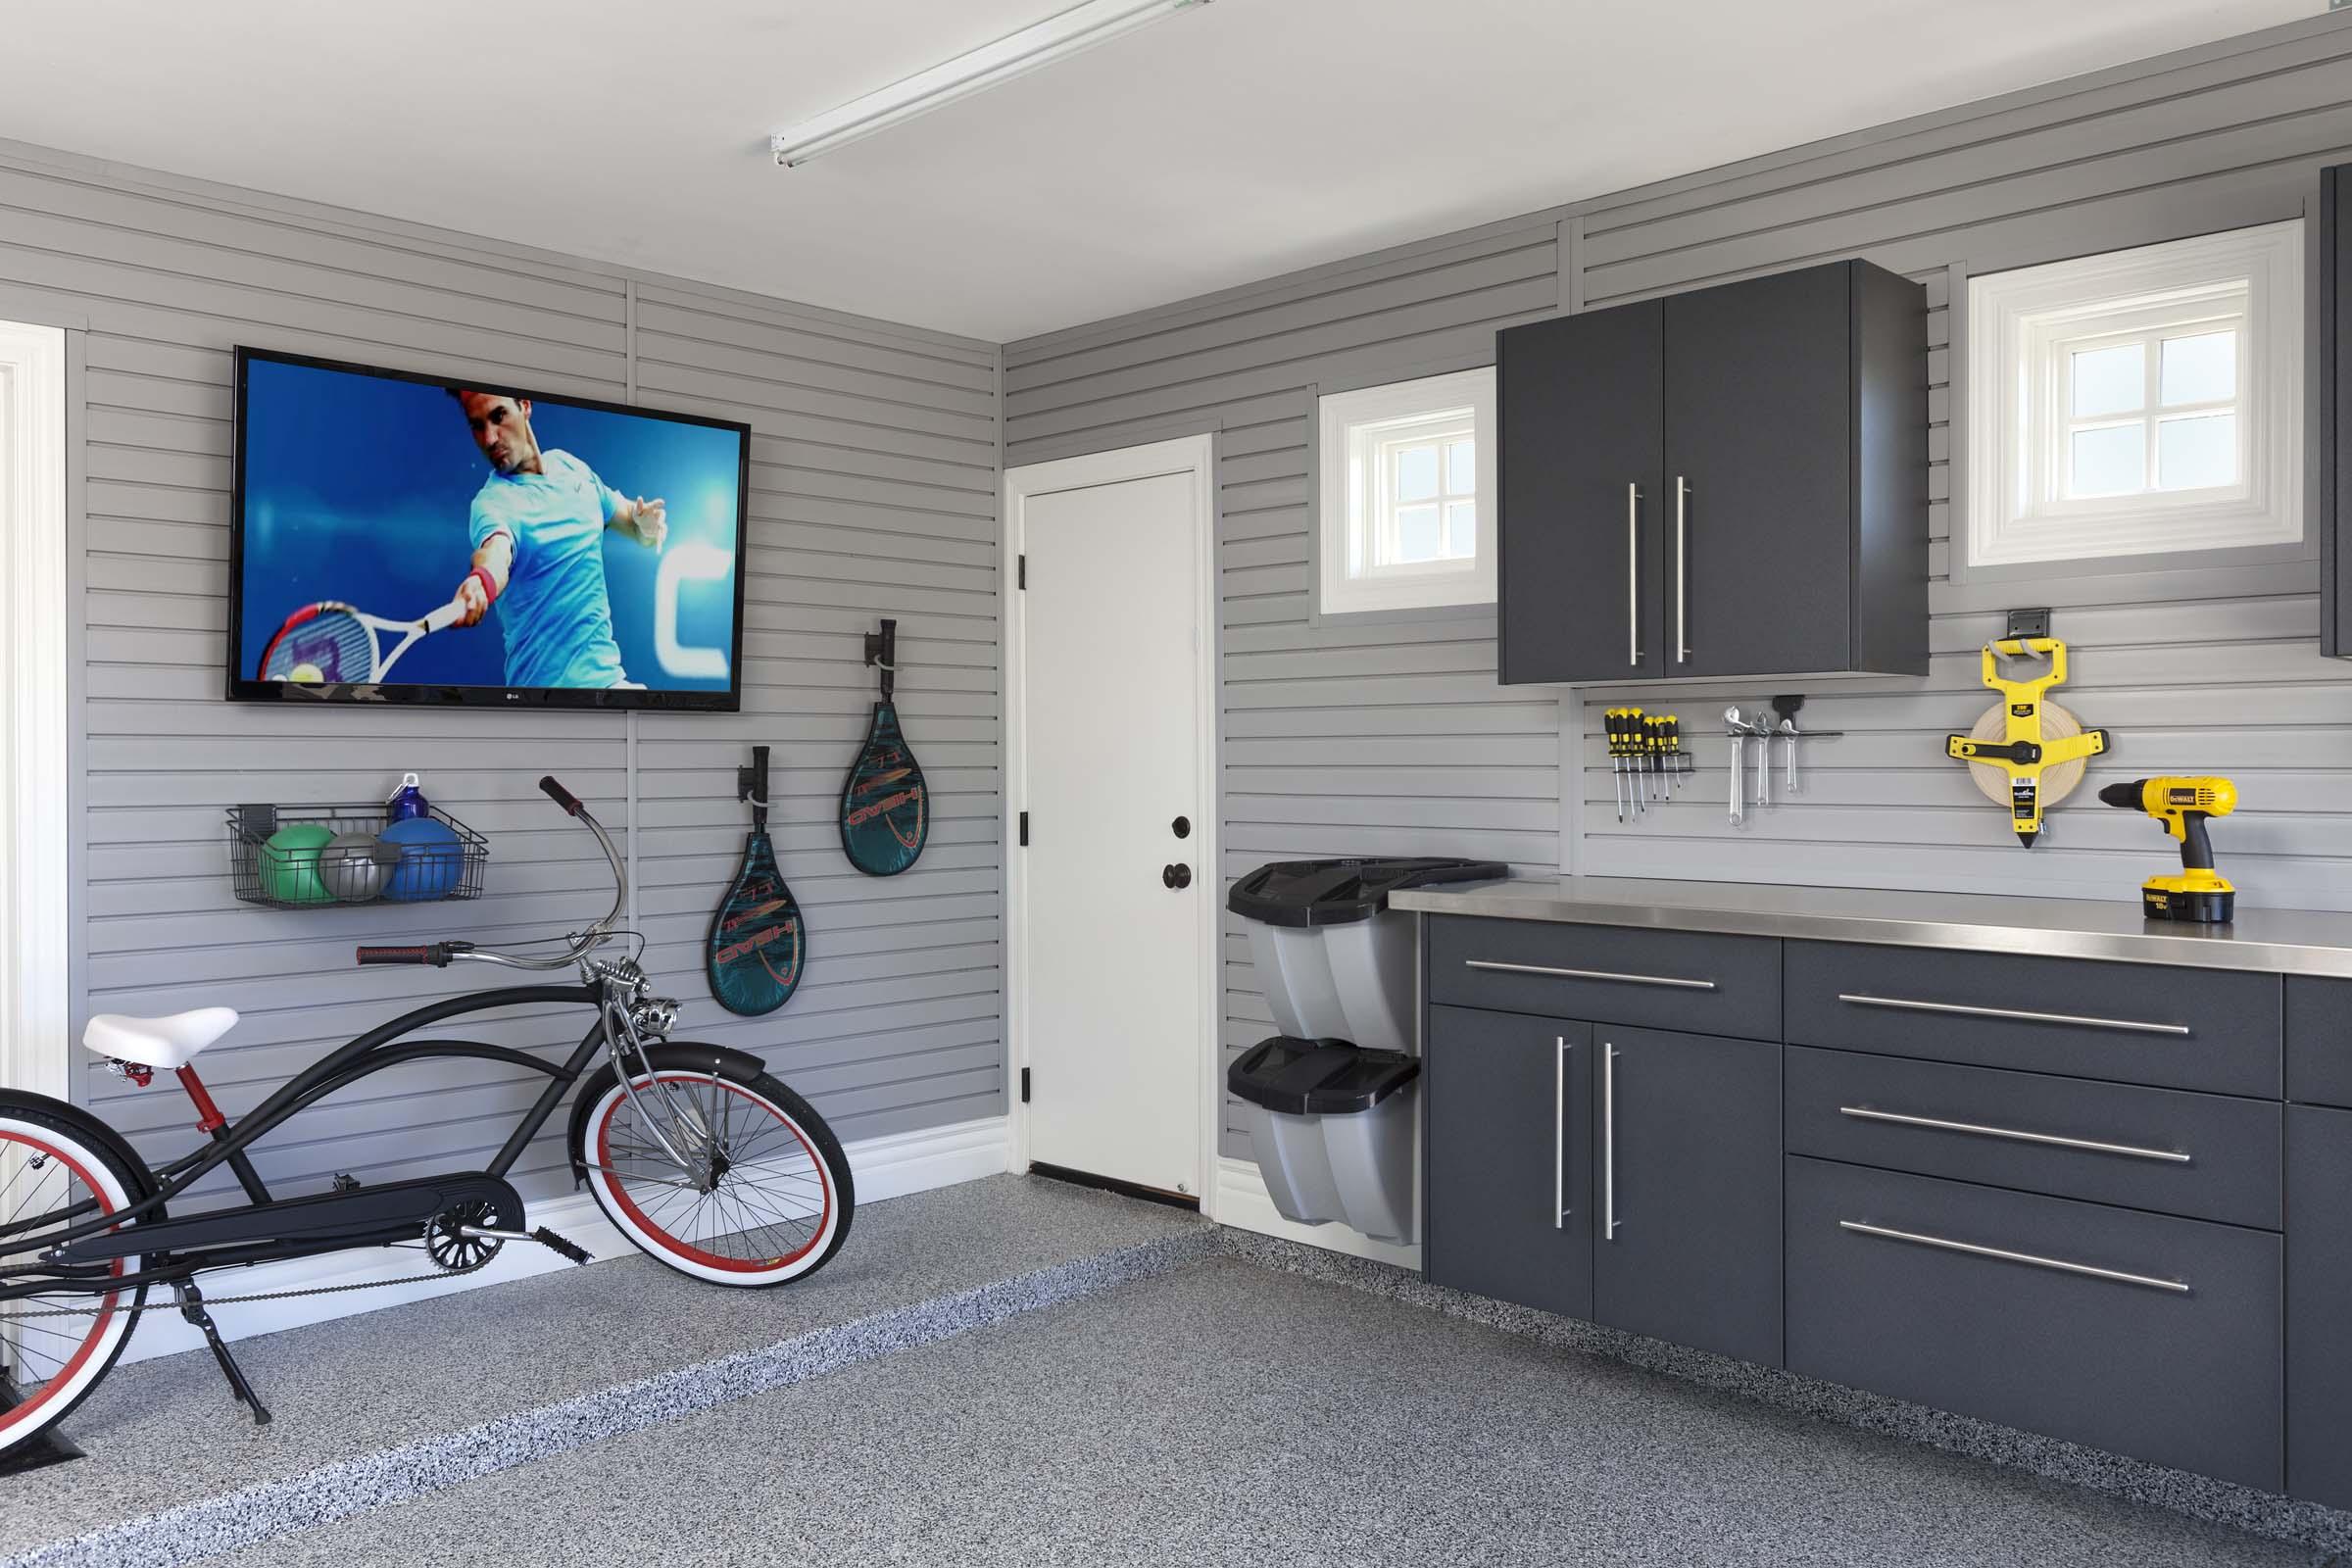 Granite Workbench-Stainless Counter-Grey Slatwall with TV HandiNet-Bike-Smoke Floor-Arcadia 2013.jpg